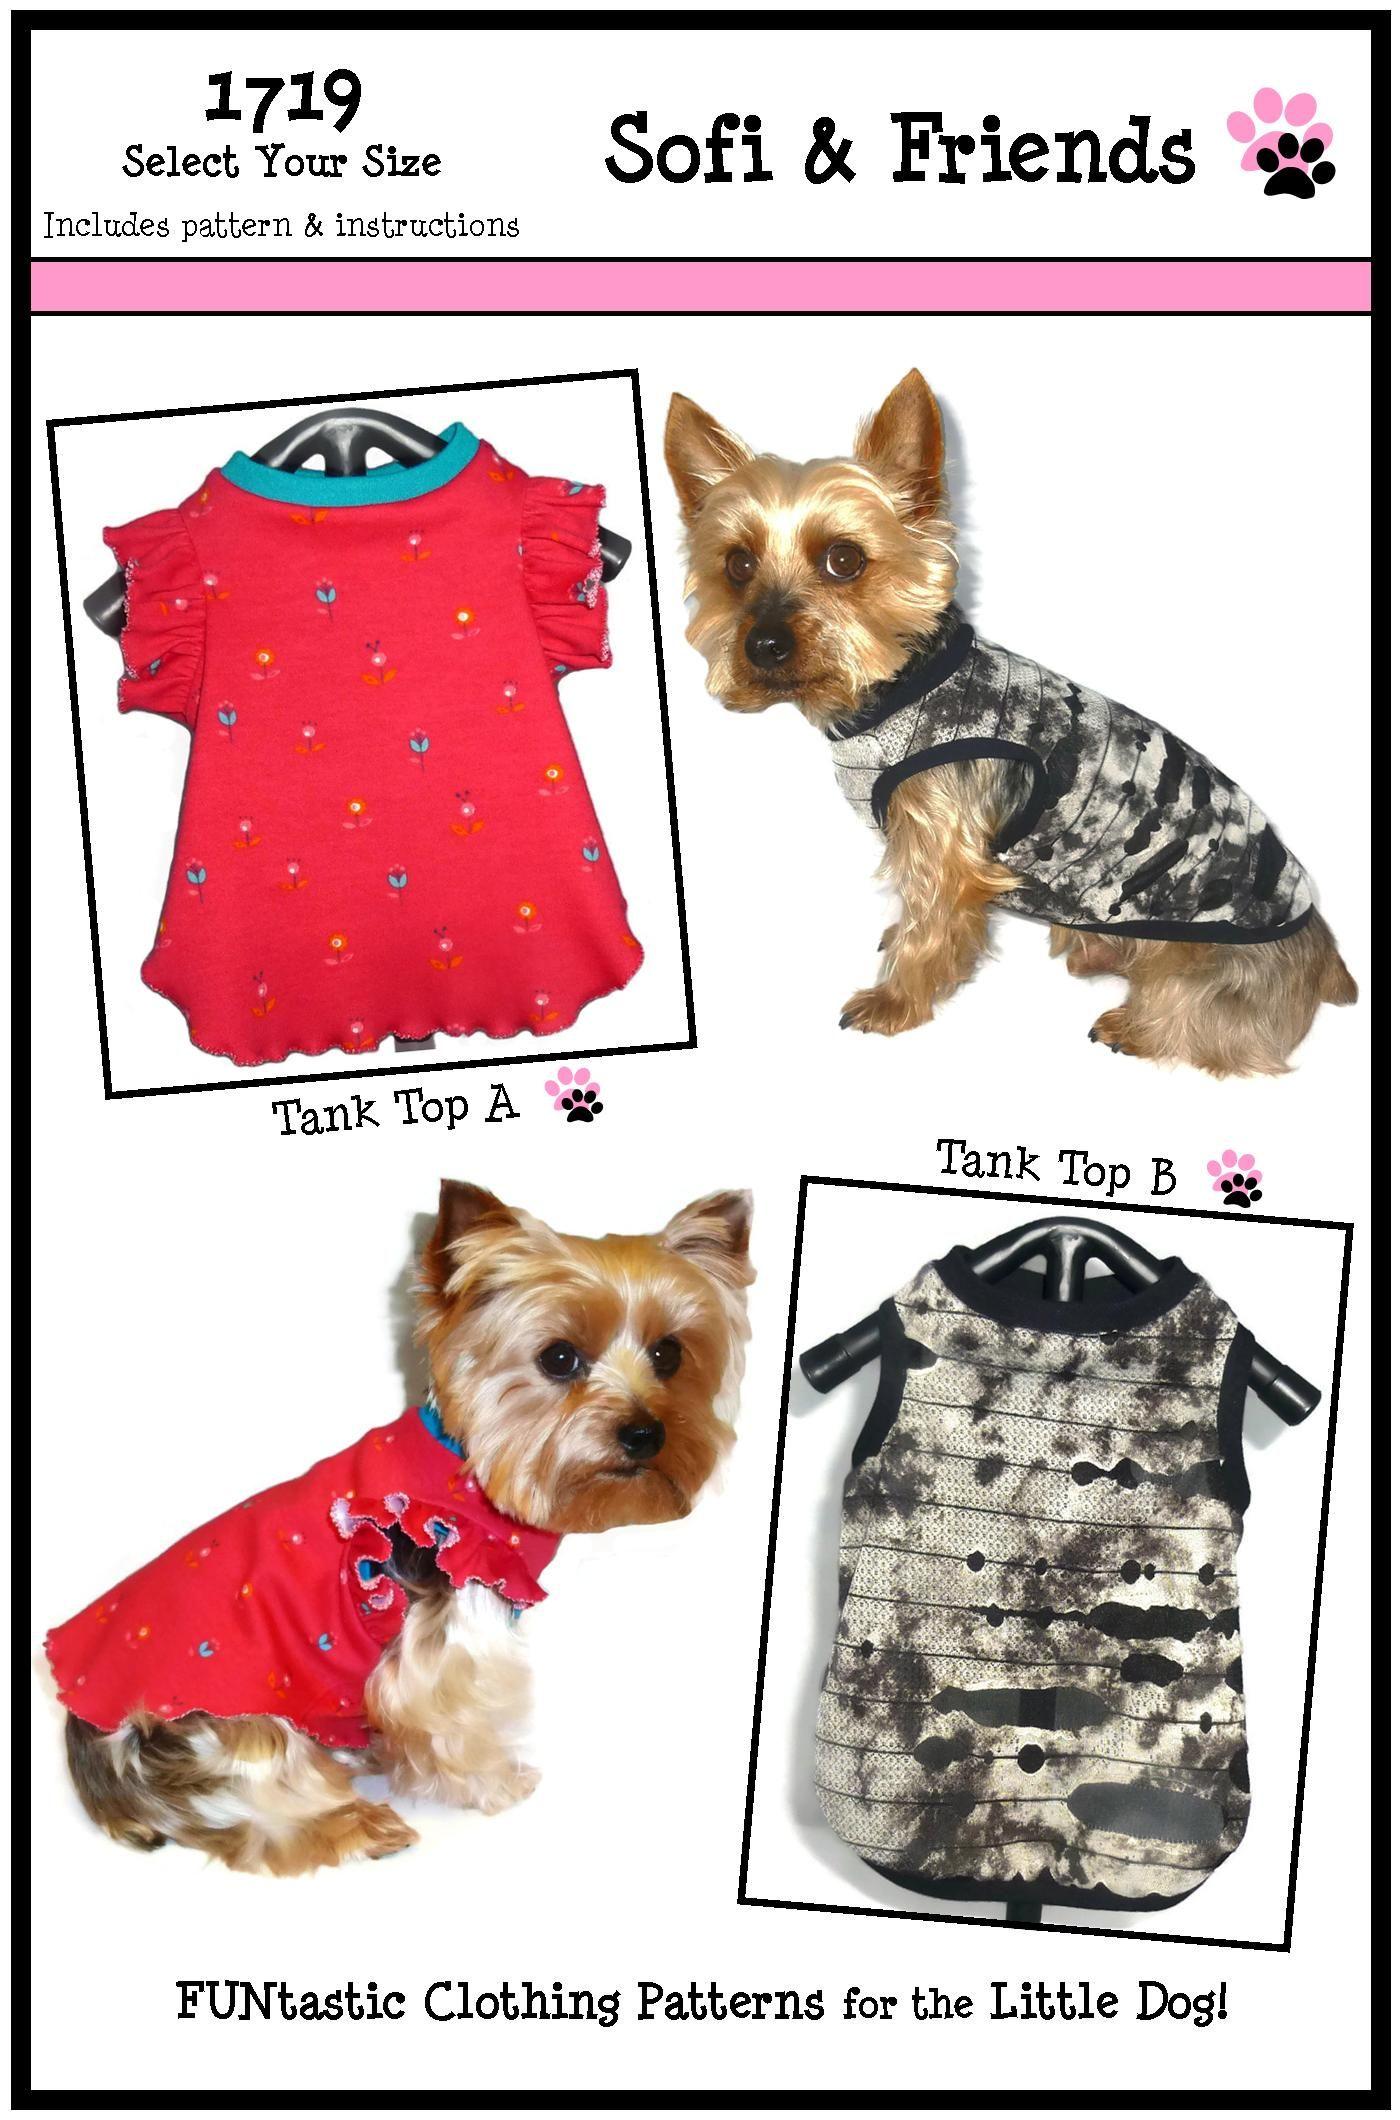 06c16854742c Dog Tank Top Pattern 1719 * Dog Shirts * Dog Tank Top * Dog Clothes ...